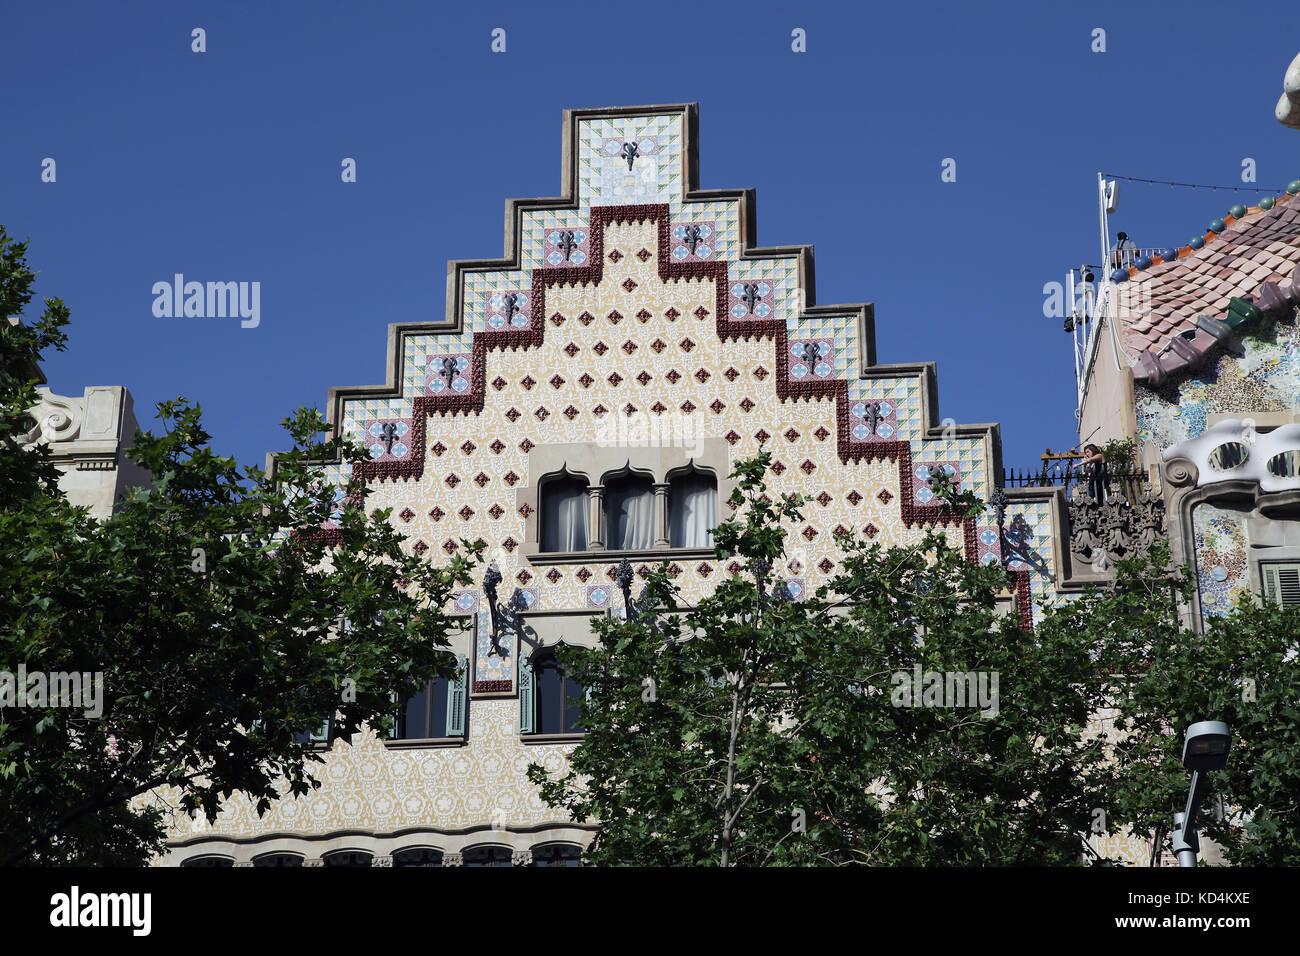 Casa Amatller on the Passeig de Gracia in Barcelona Designed by the architect Puig i Cadafalch Catalunia Spain - Stock Image